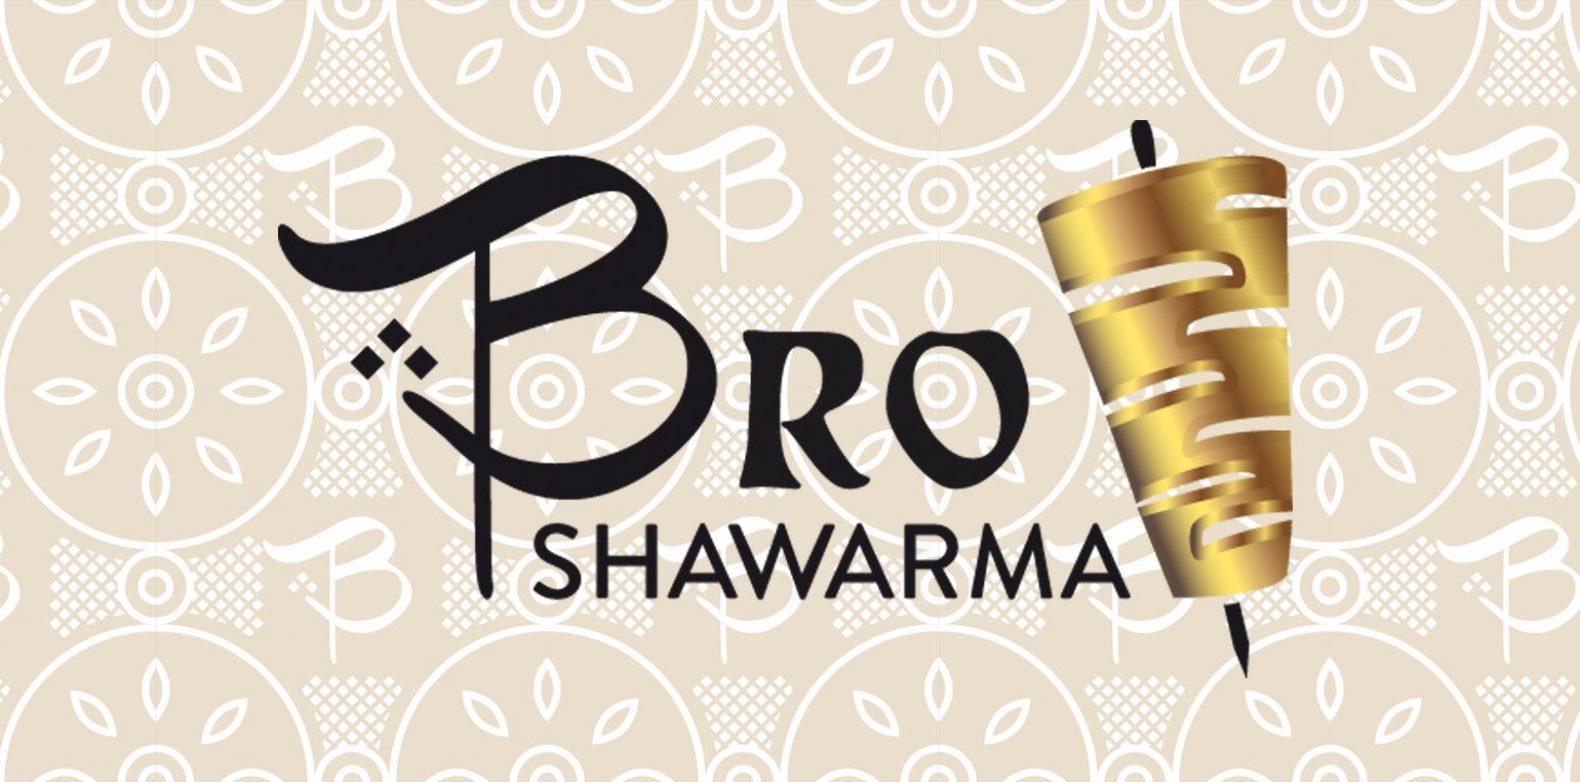 Shawarma Bro